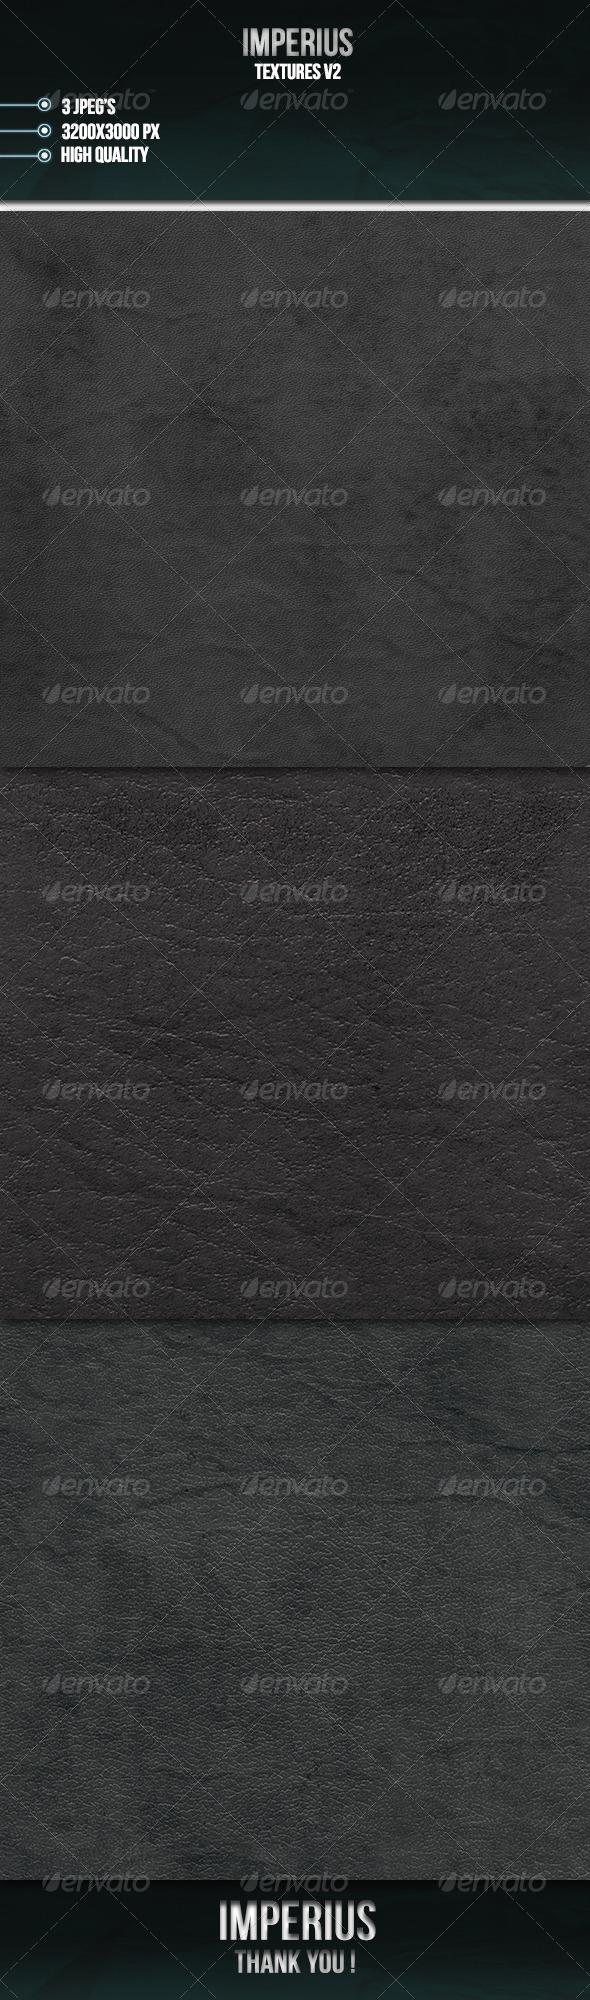 Textures V2 - Fabric Textures